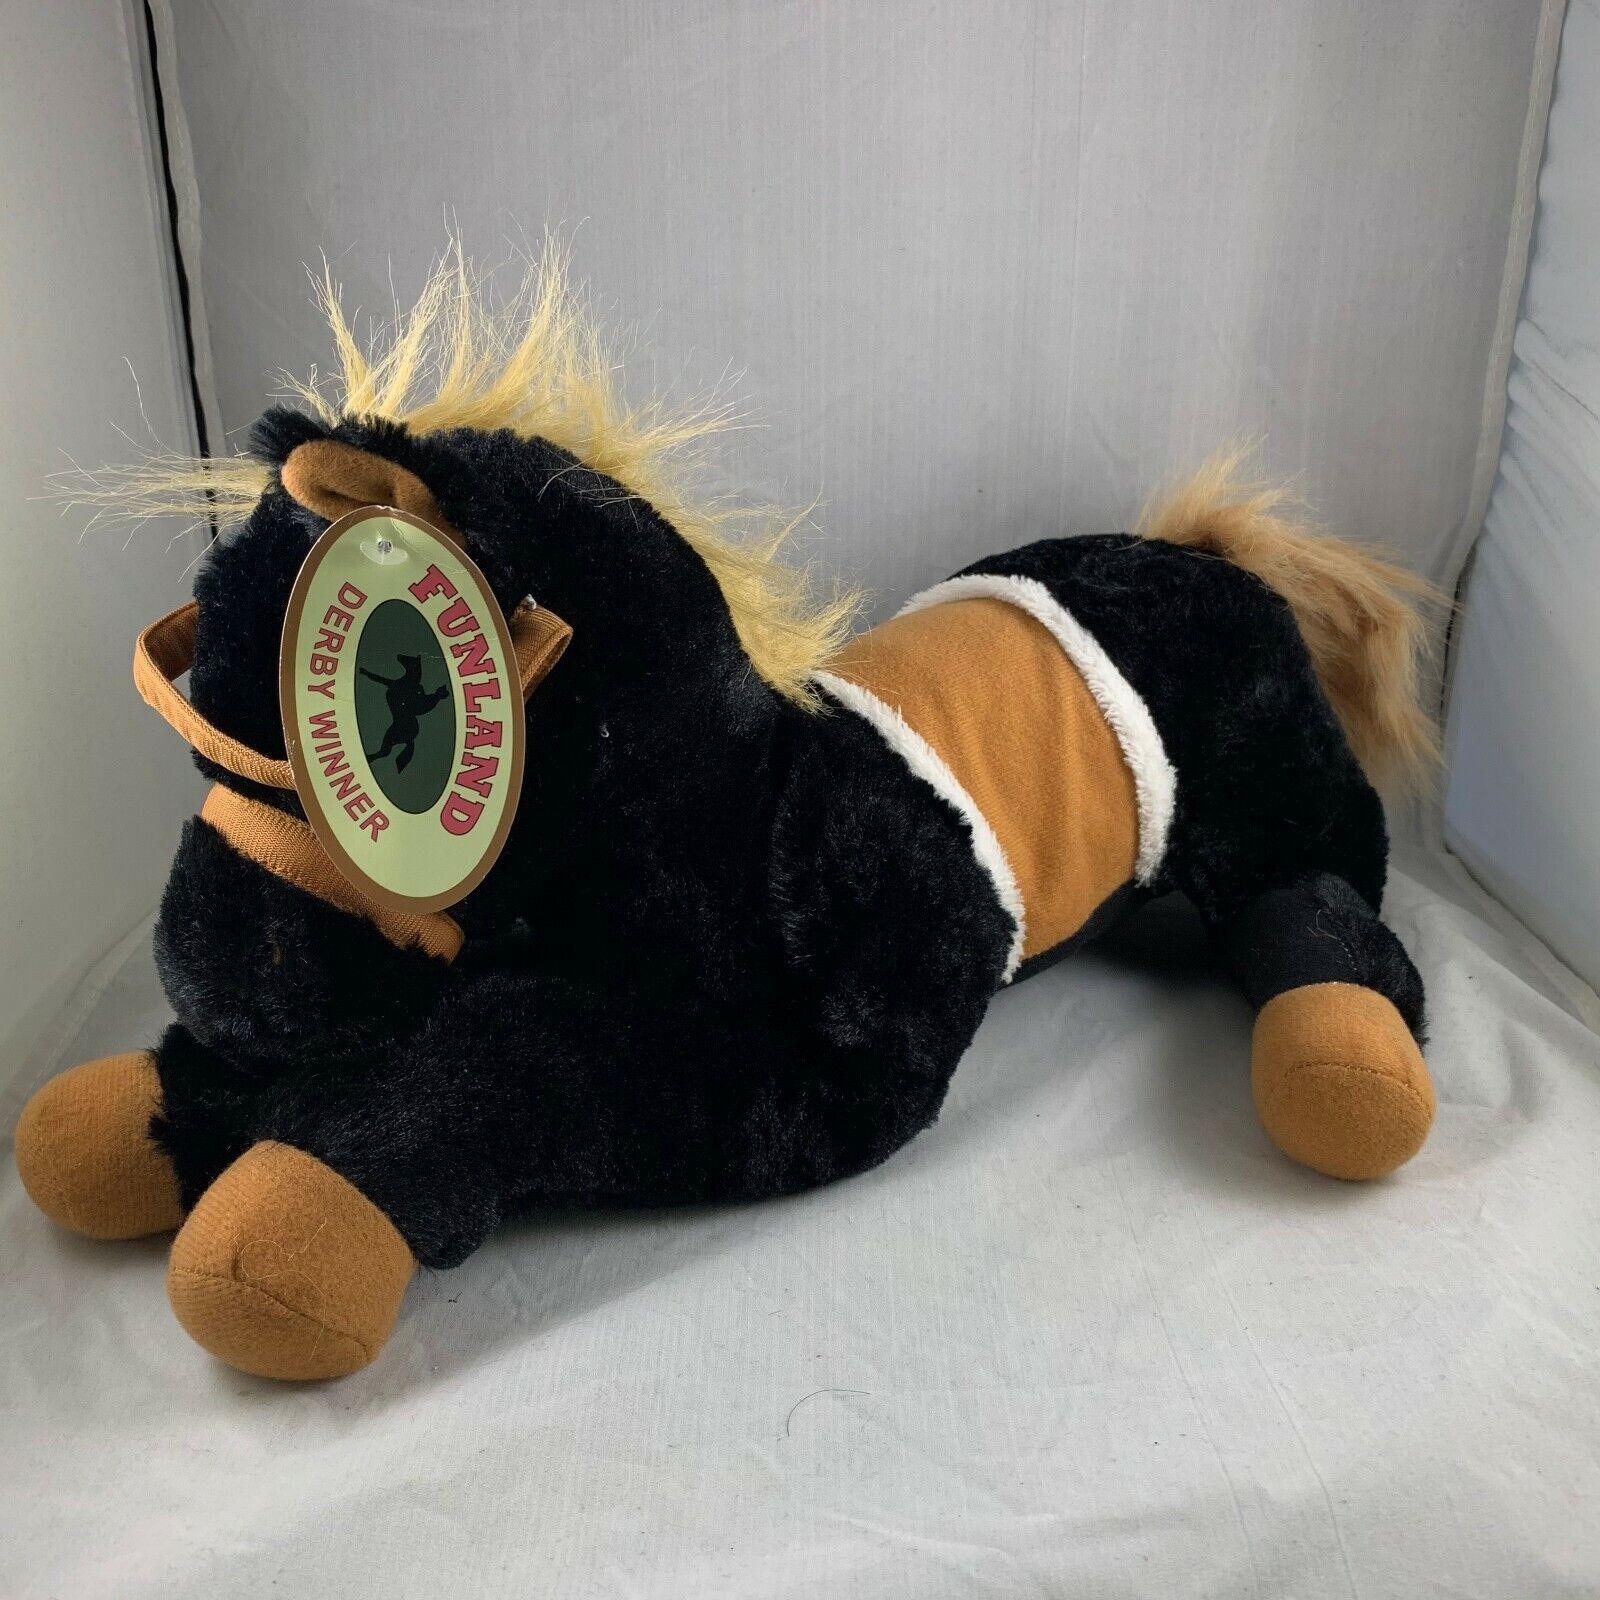 FUNLAND DERBY WINNER WINNER WINNER GOFFA INT'L CORP LARGE BLACK STUFFED PLUSH HORSE TOY NWT 493